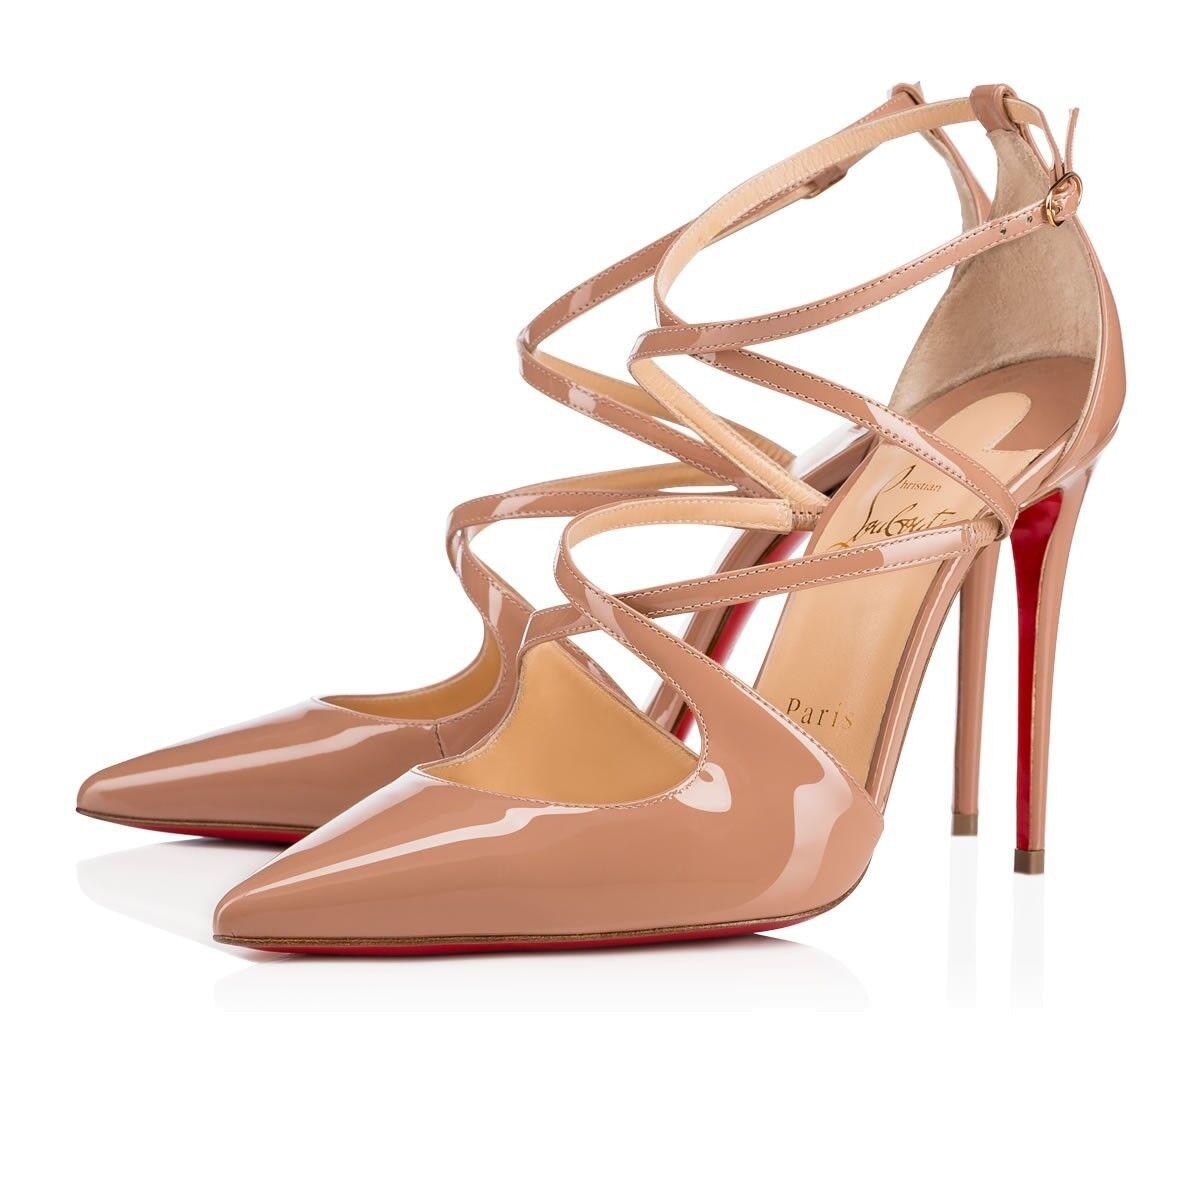 NIB Christian Louboutin Crossfliketa 100 Nude Patent Strap Sandal Heel Pump 39